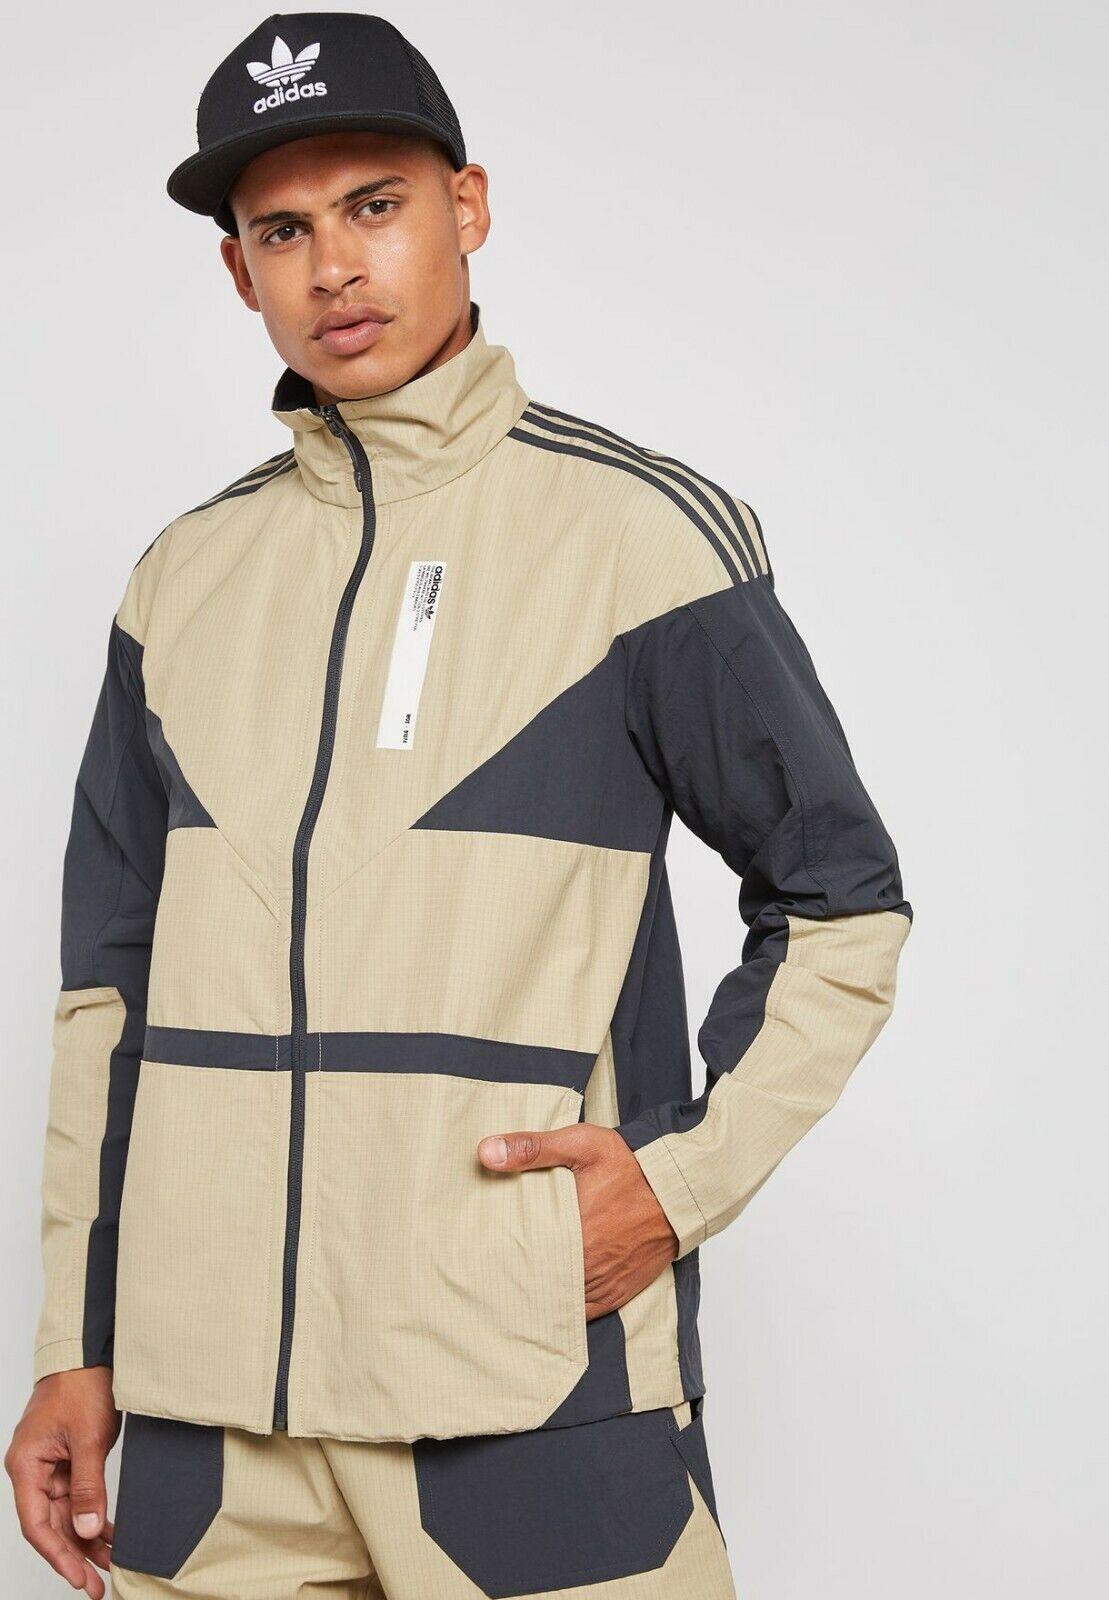 Adidas Original Nmd Trainingsanzug Oberteil Herren Roh Gold Farbblock Outdoor